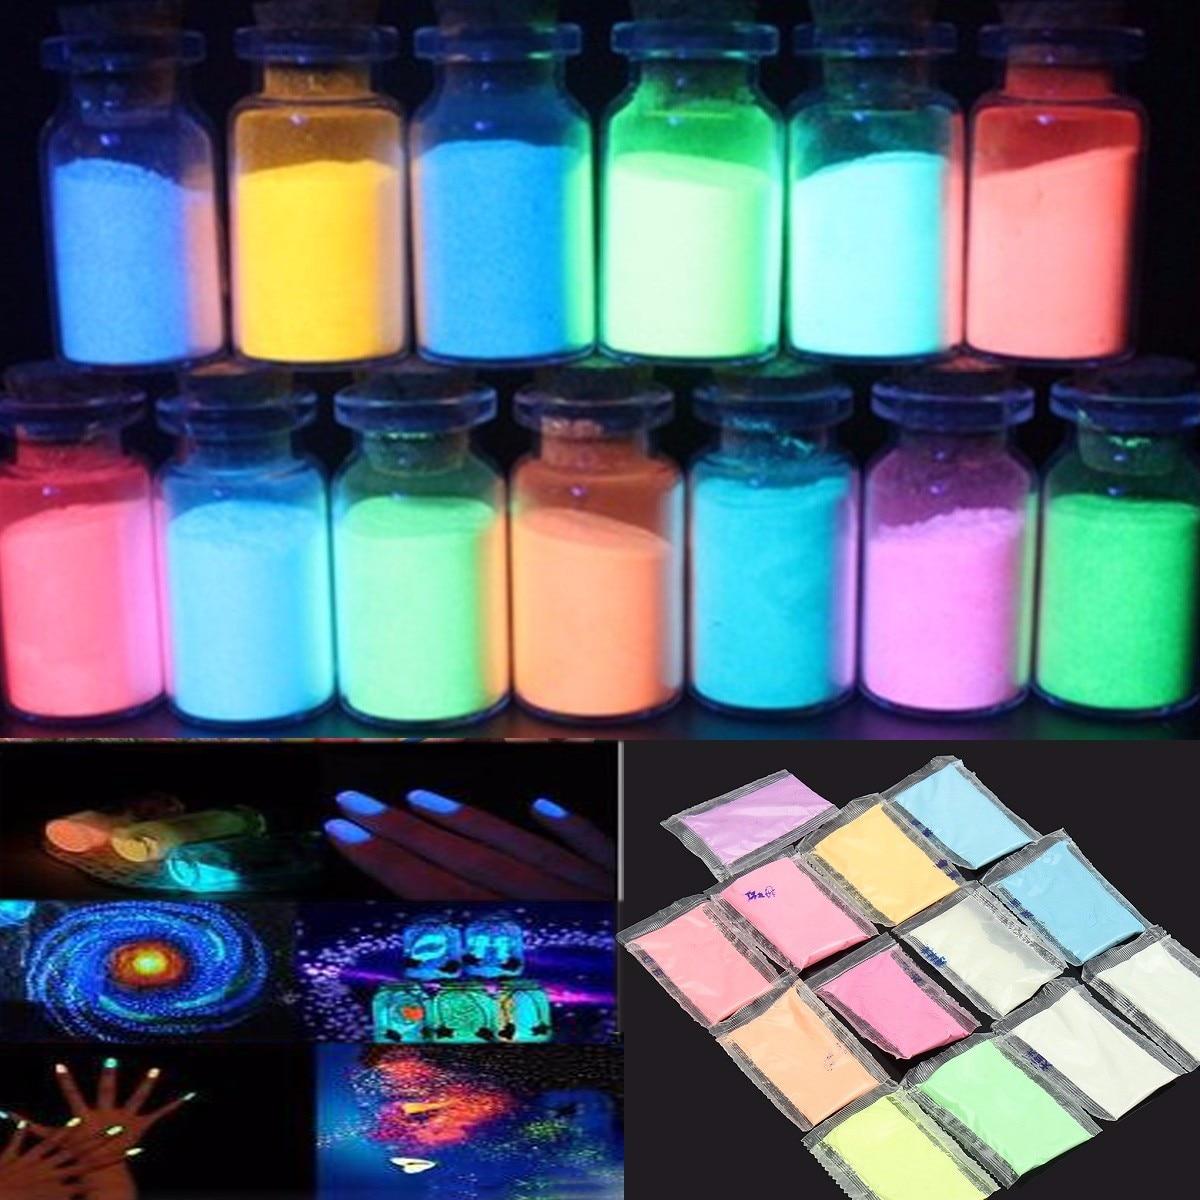 13package/set Phosphor Luminous Powder For Party DIY Decoration Paint Print Random Colors Night Coating